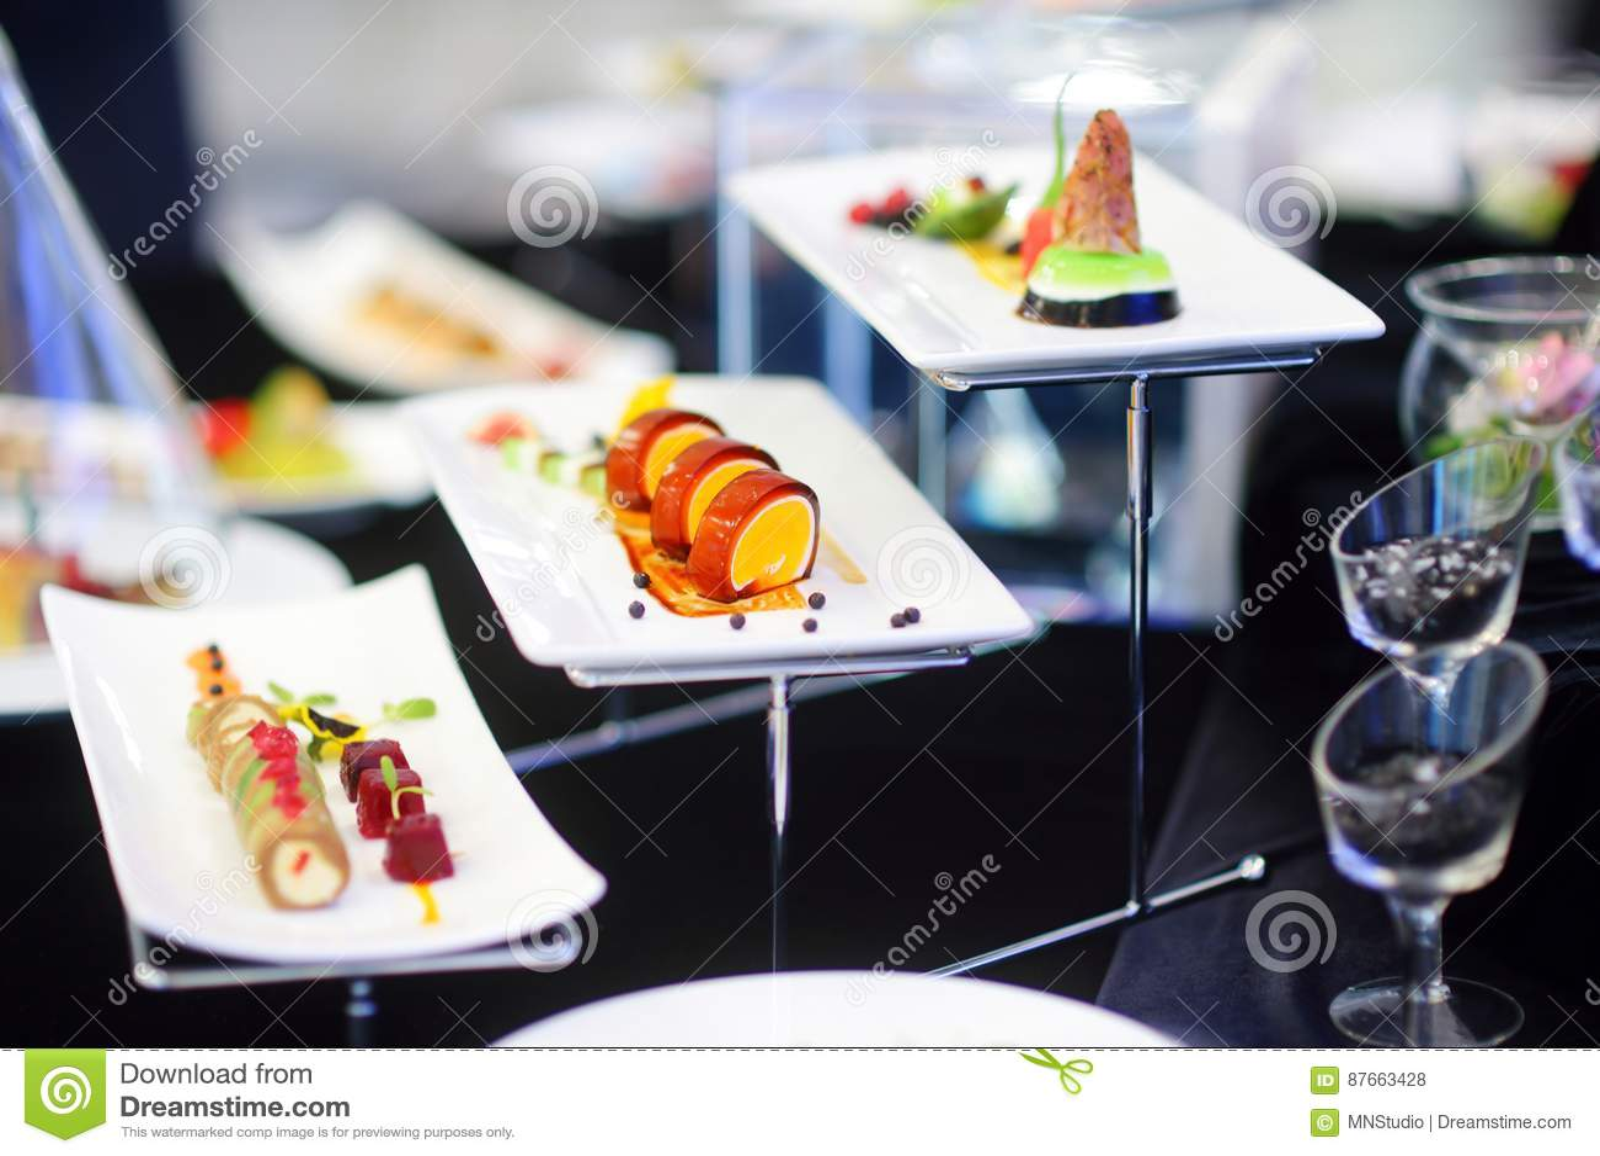 molecular modern cuisine various fancy dishes on white plates in  - cuisine fancy modern